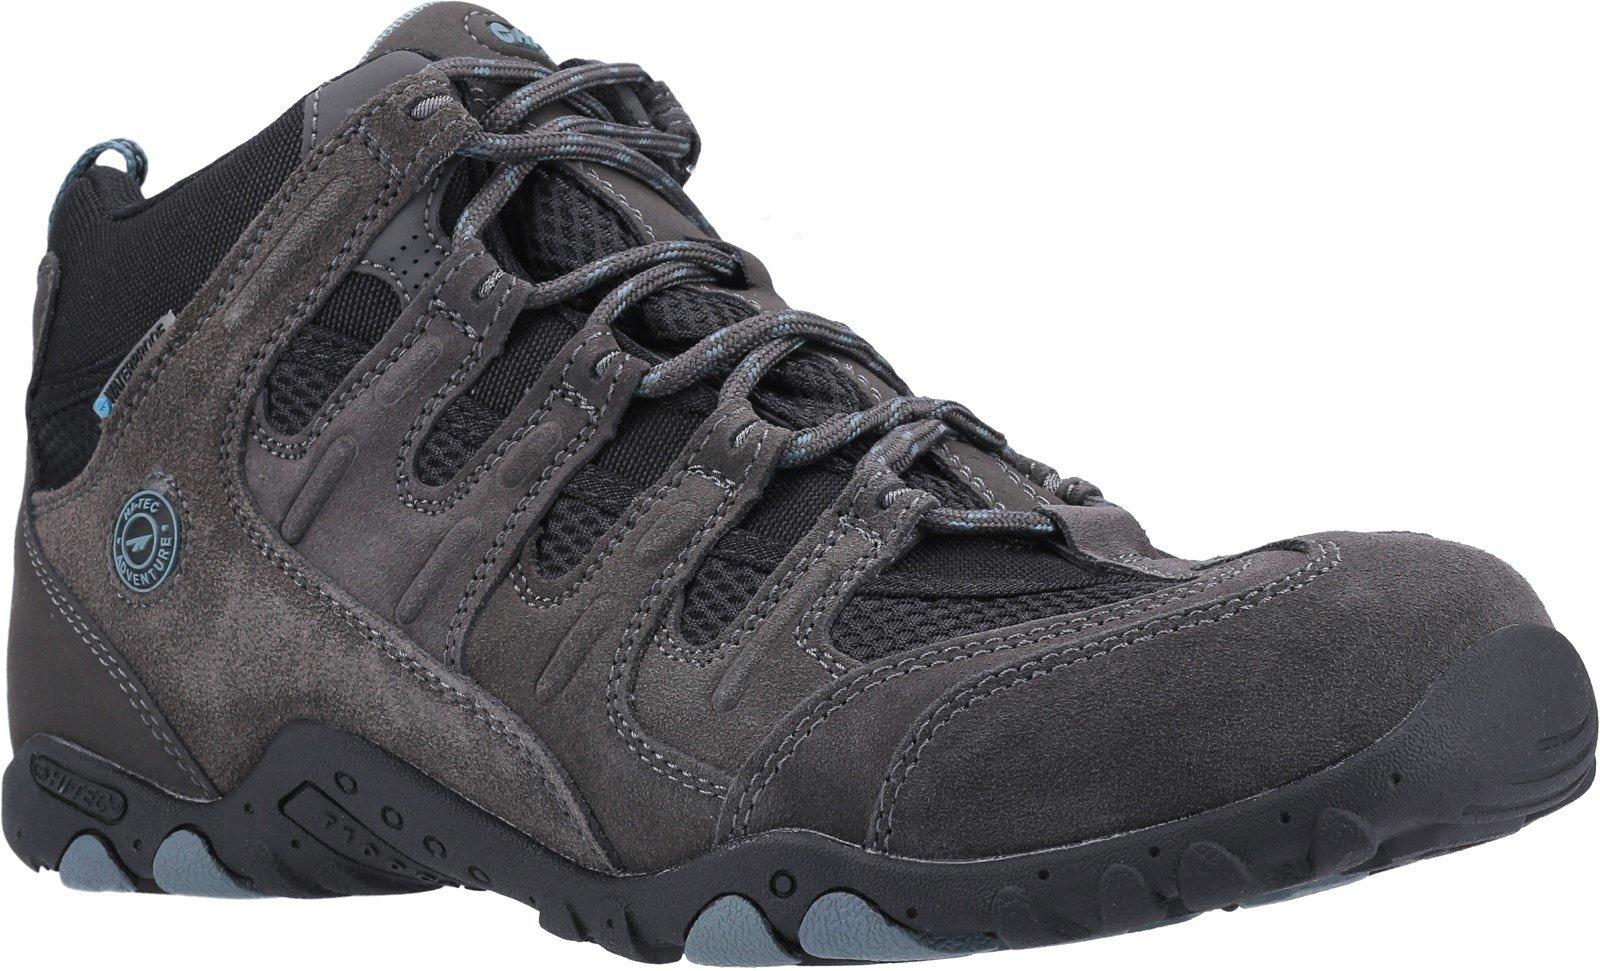 Hi-Tec Men's Quadra Classic Multi-Sport Boots Multicolor 31630 - Charcoal/Graphite/Goblin Blue 7